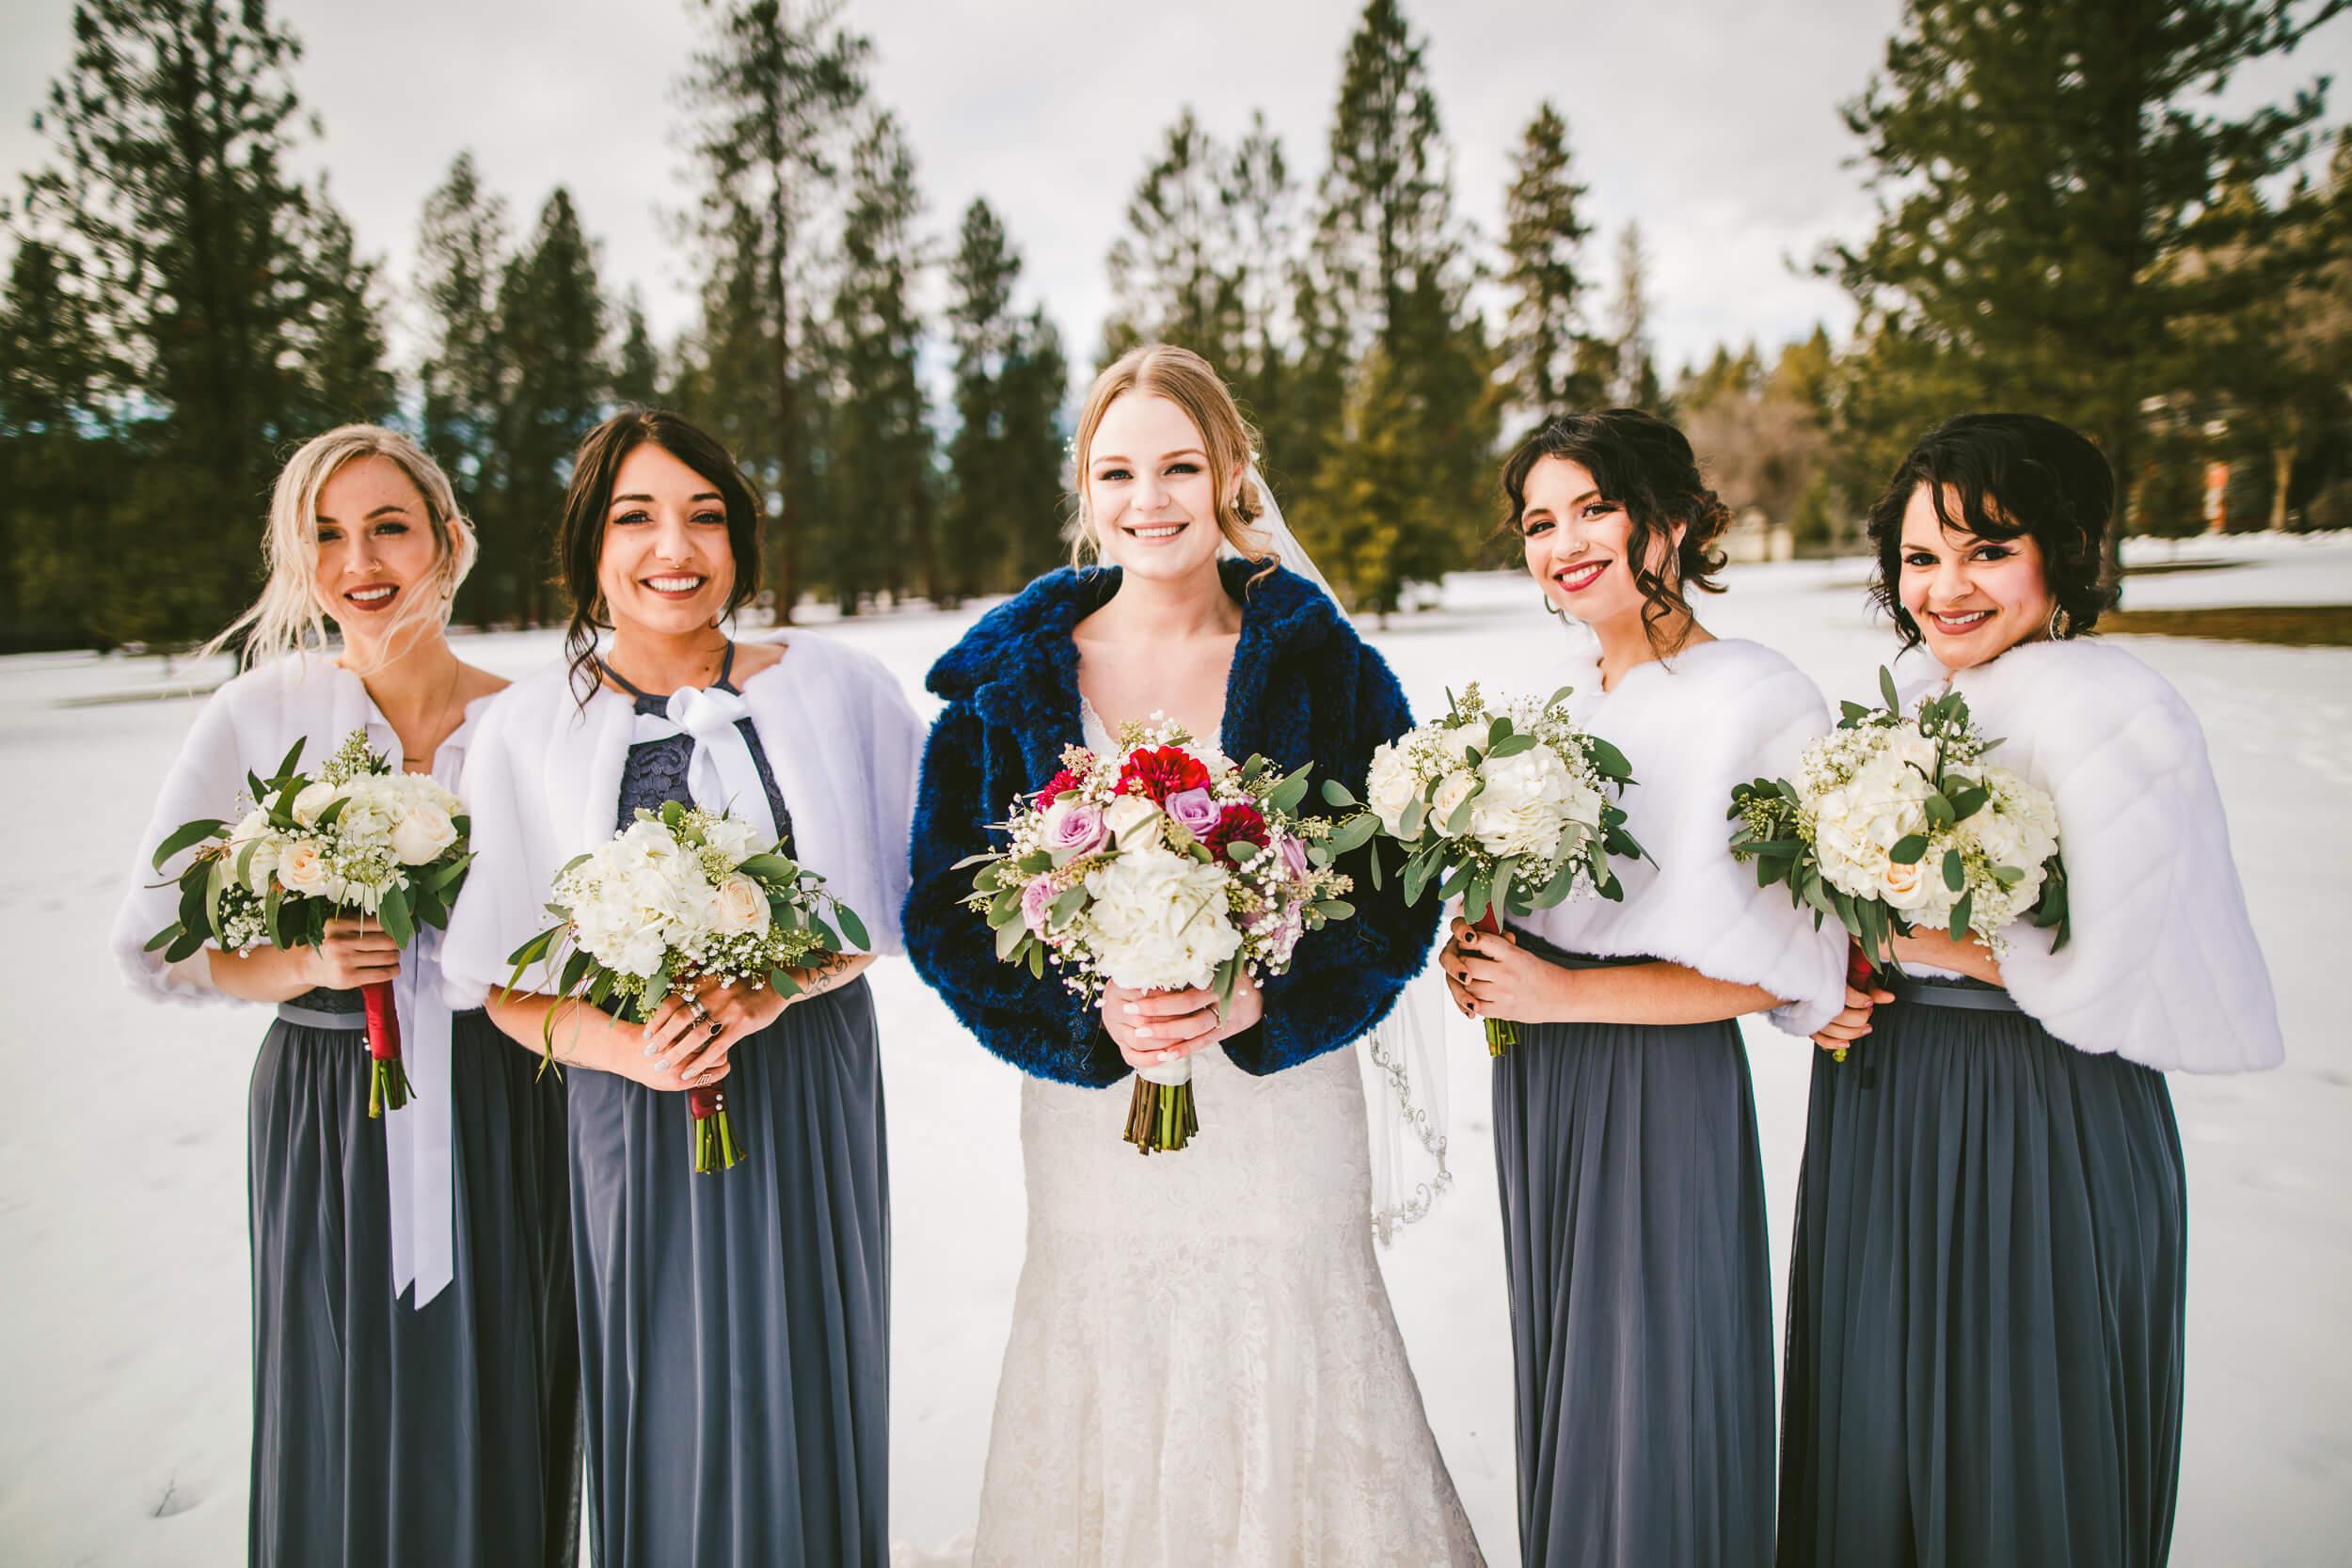 mukogawa winter wedding in spokane (103).jpg